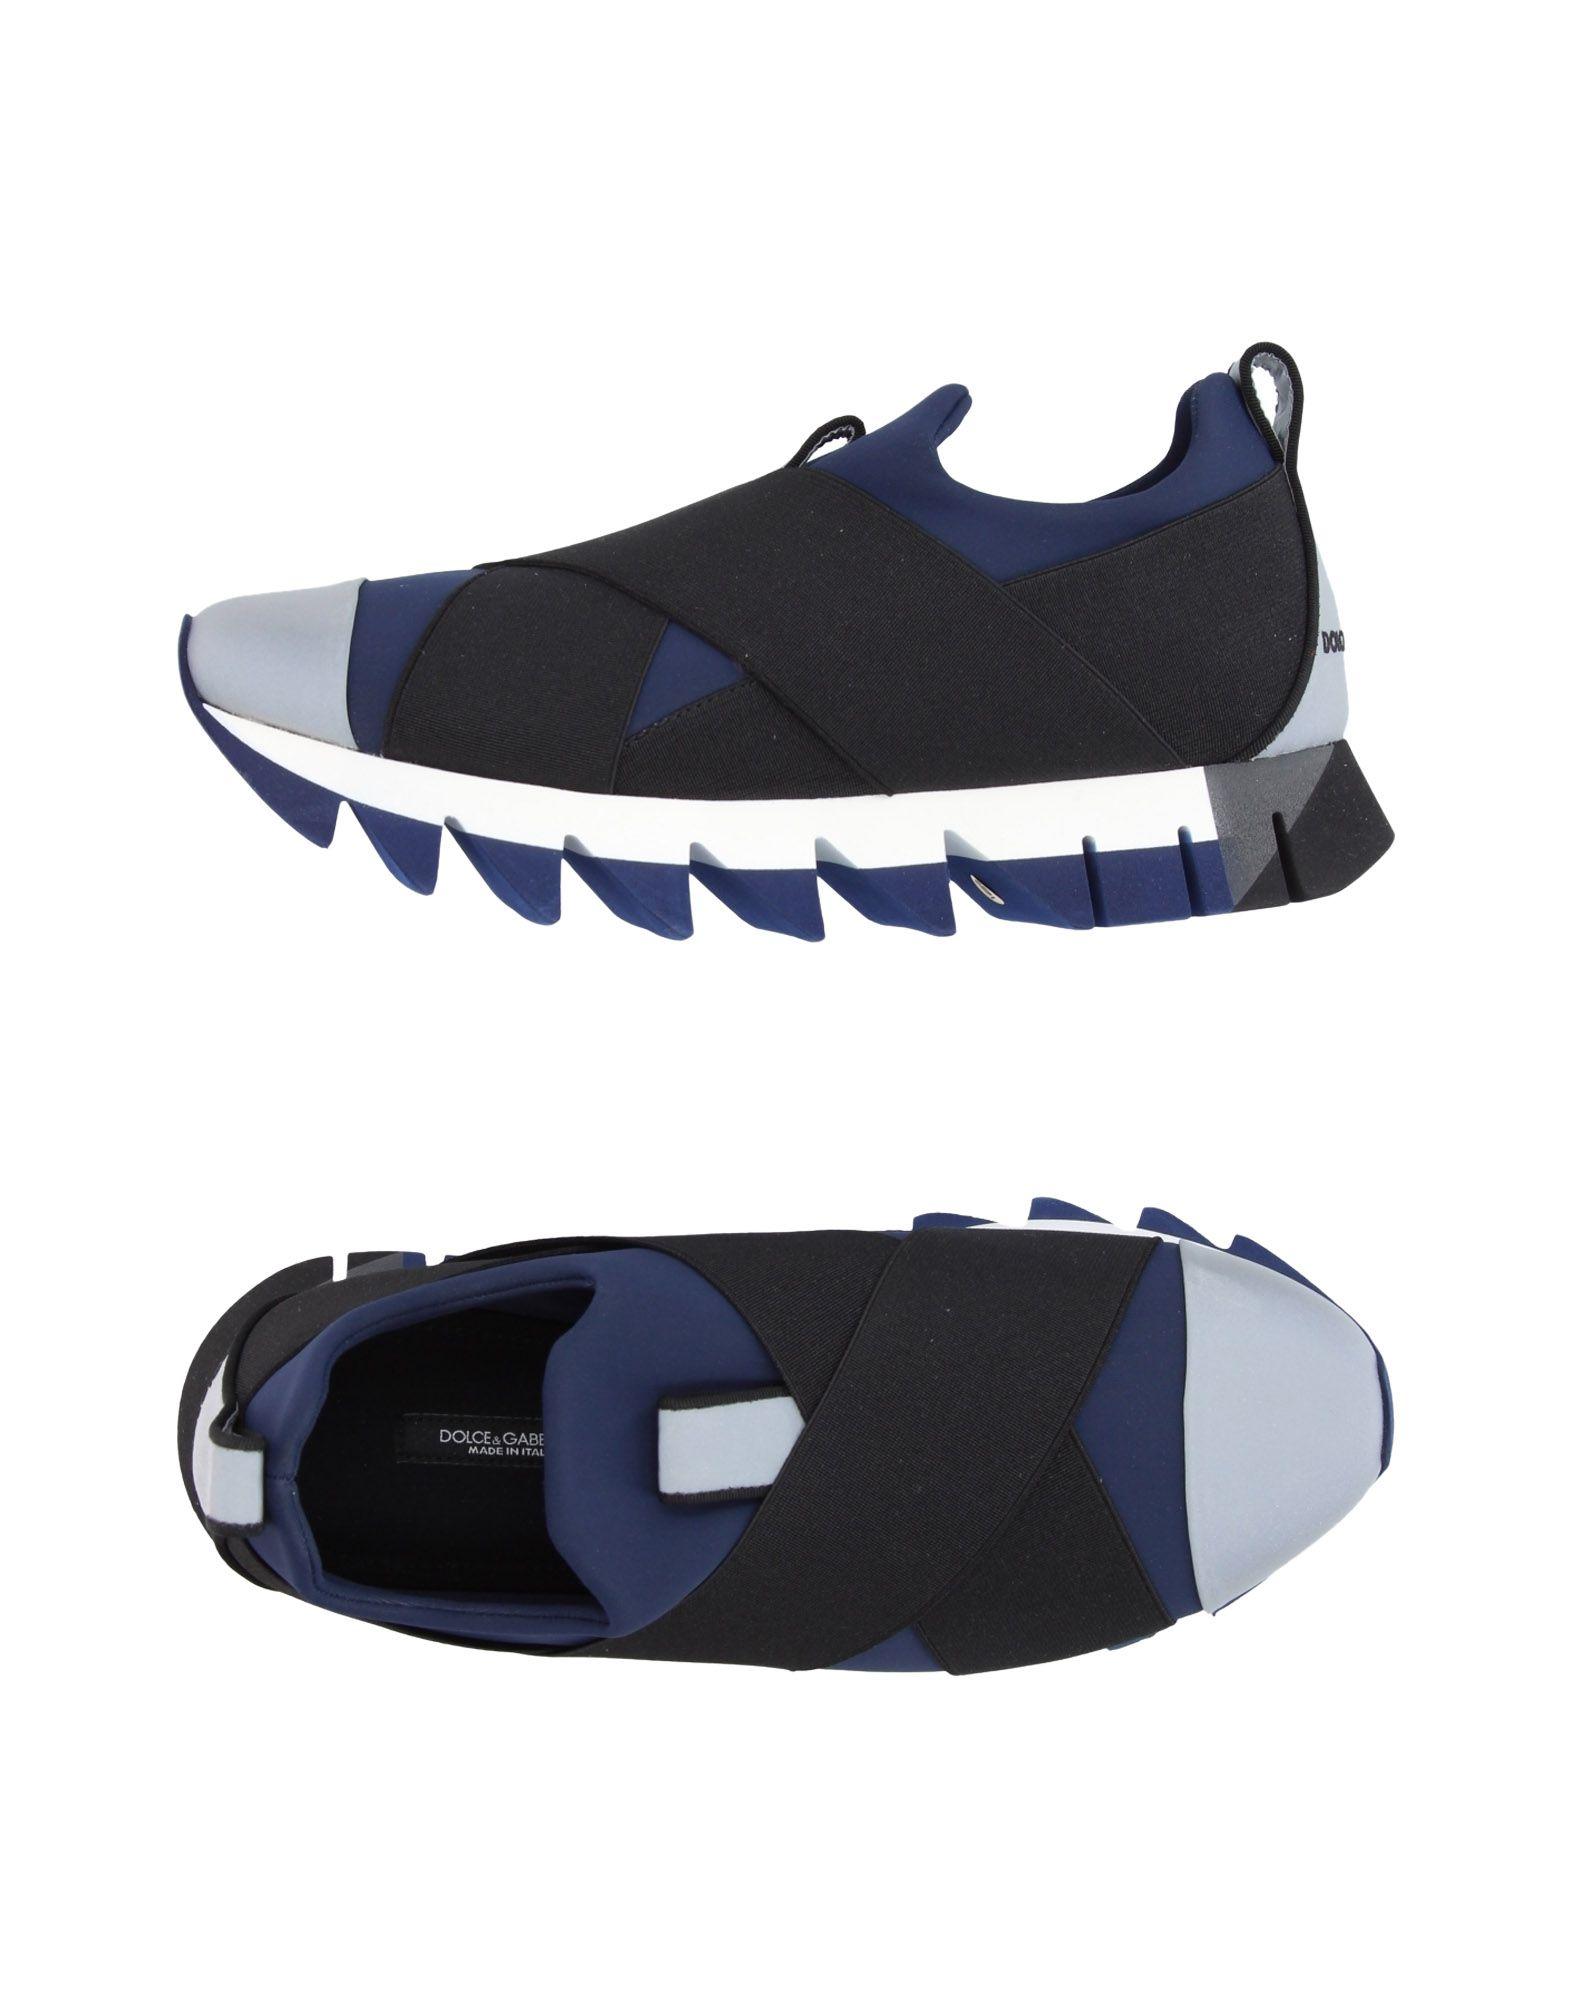 Dolce & 11206109AG Gabbana Sneakers Herren  11206109AG & Gute Qualität beliebte Schuhe ad7433